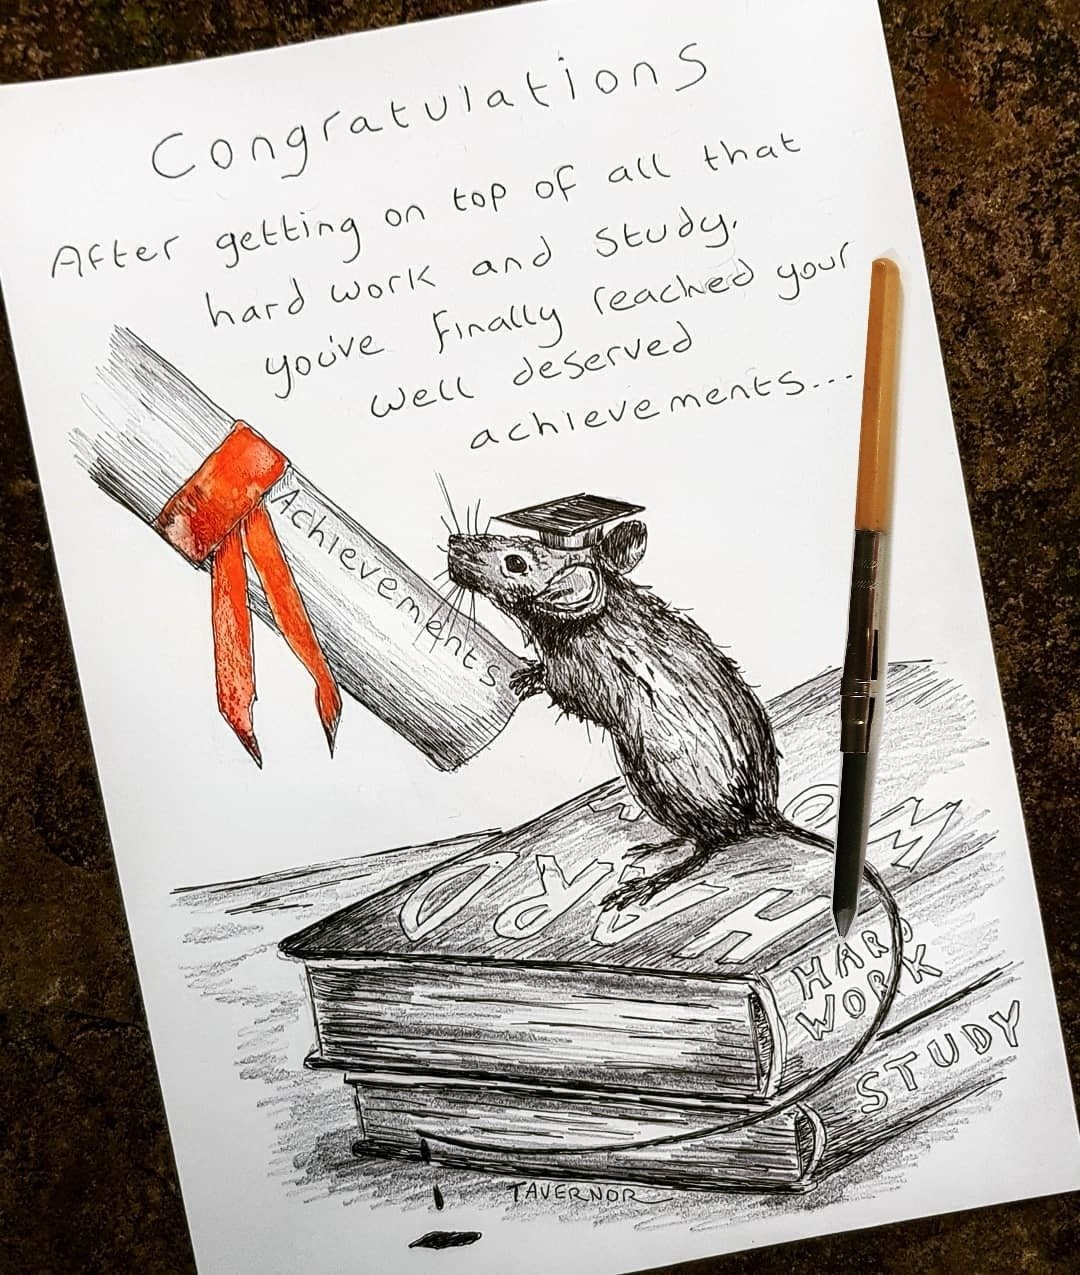 Congratulations Paul Tavernor Mouse